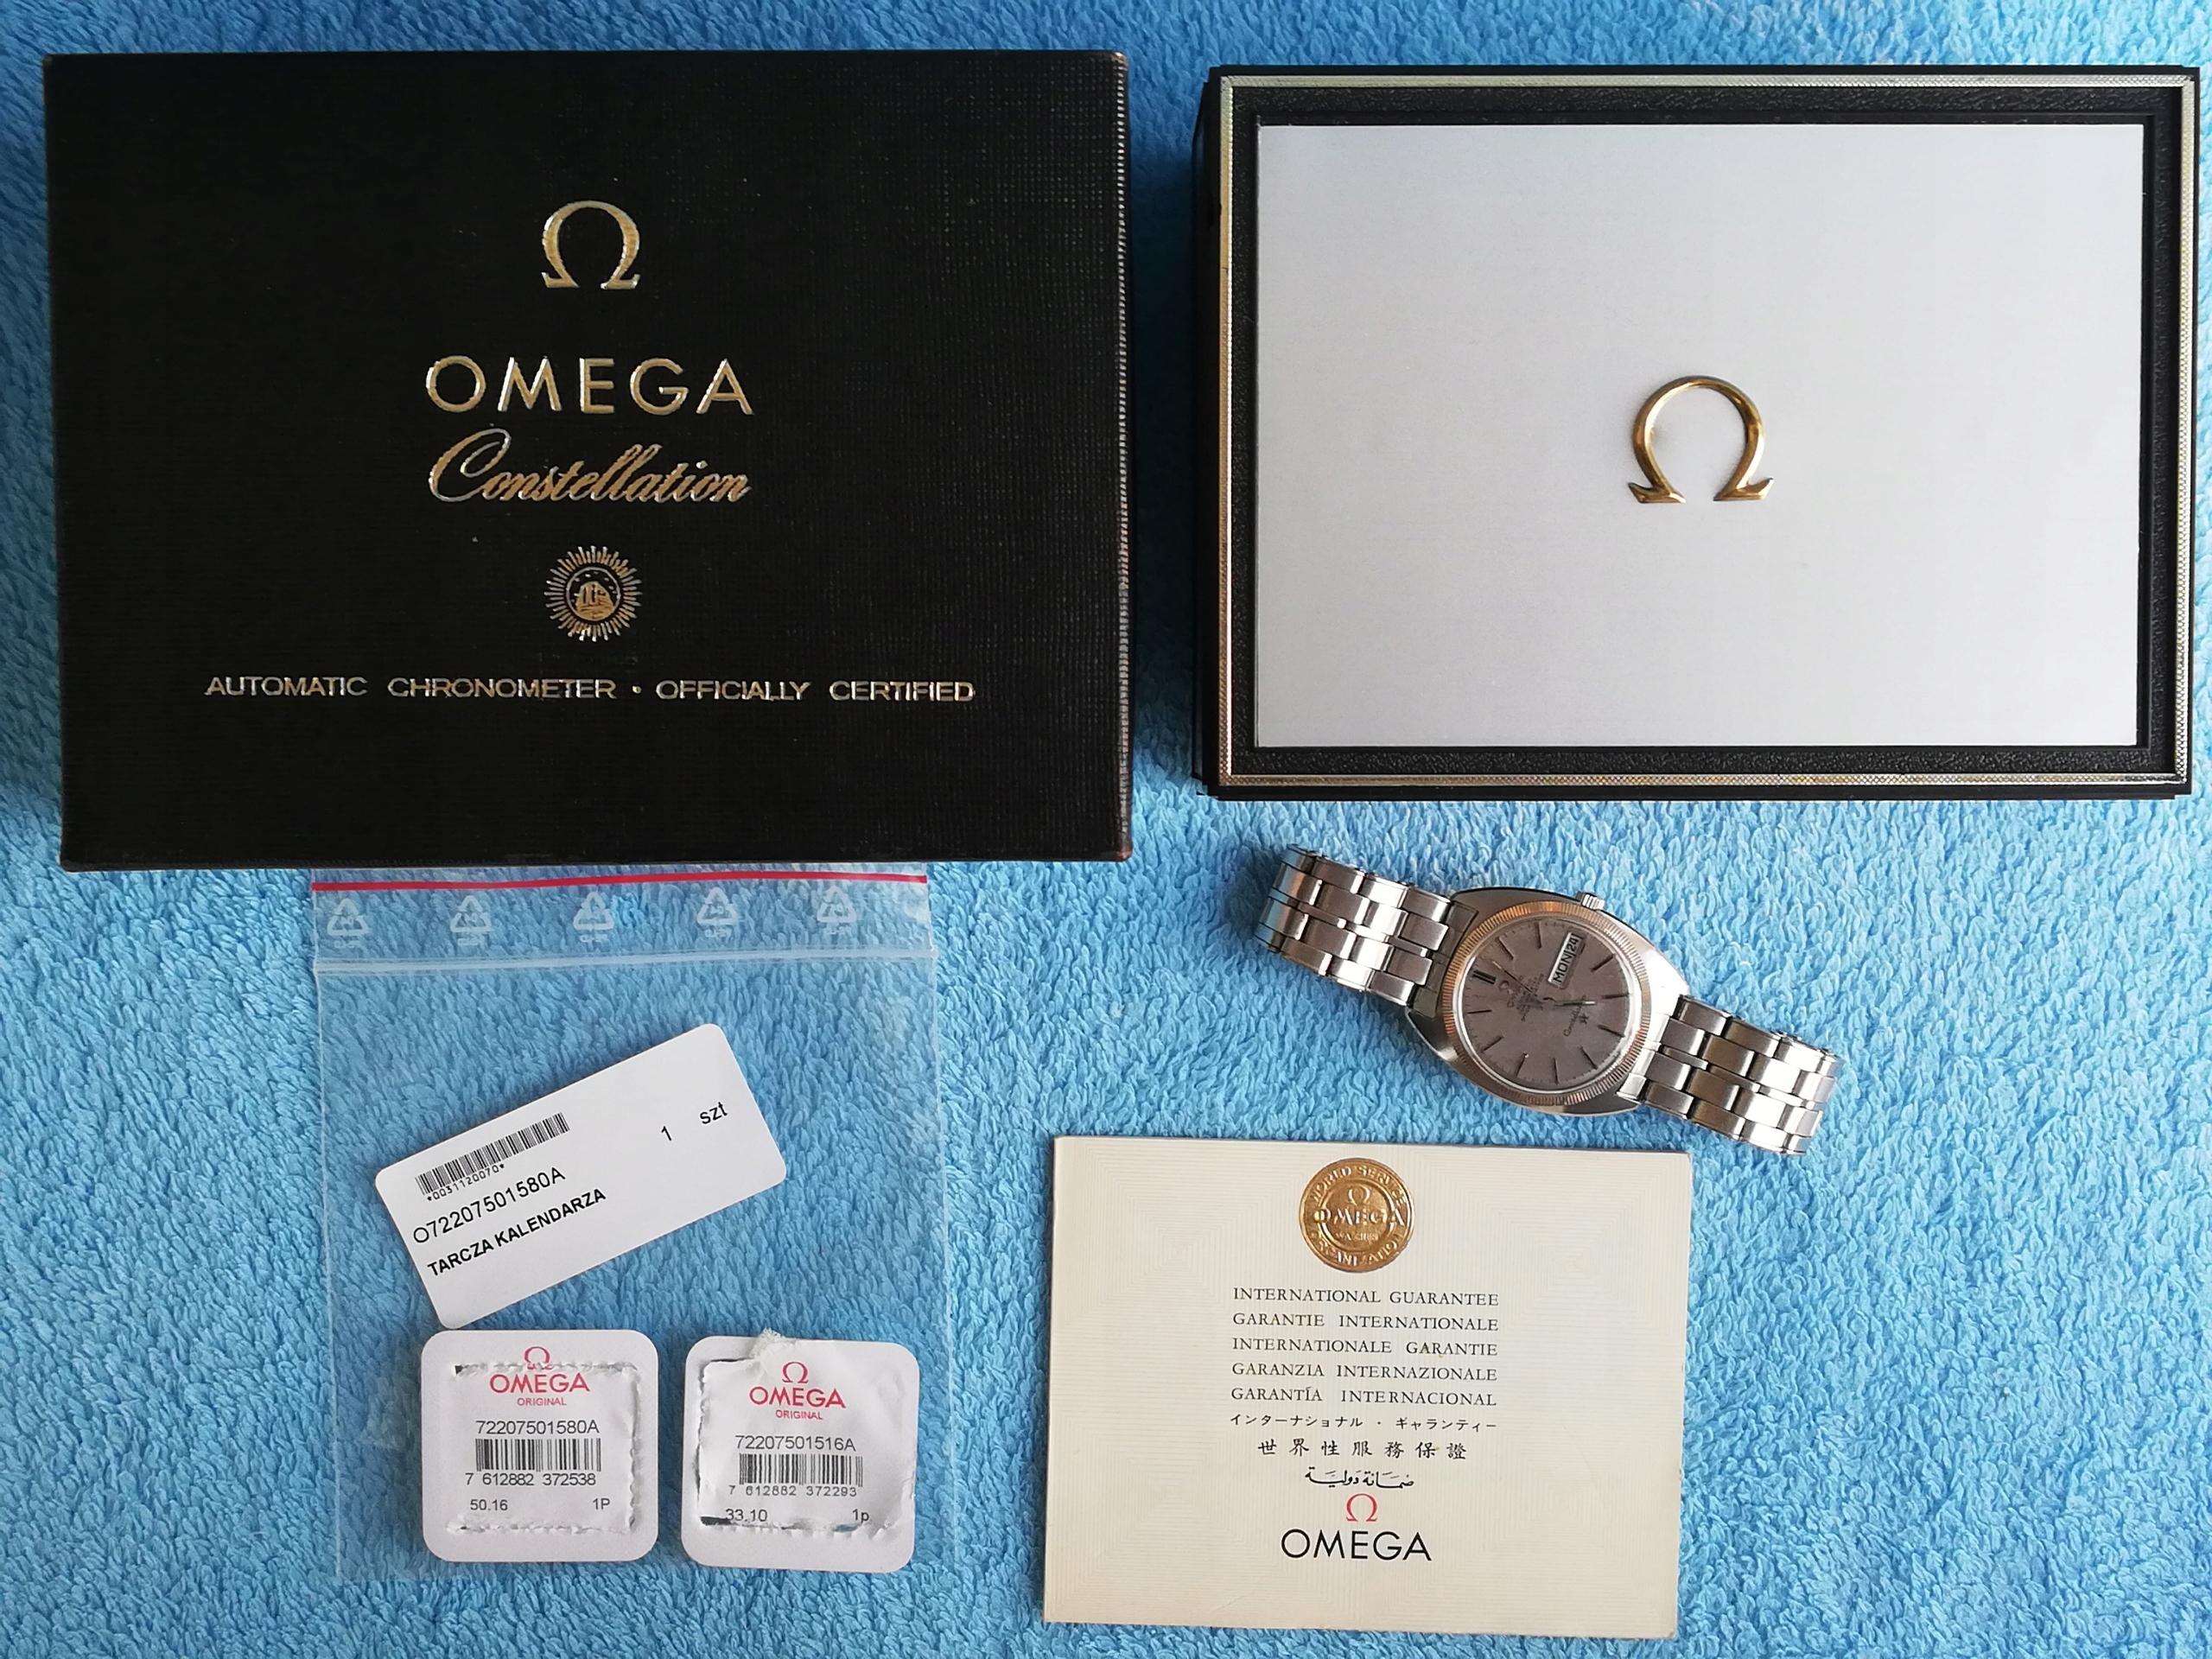 Omega Constellation Automatic Chronometer 1968r.